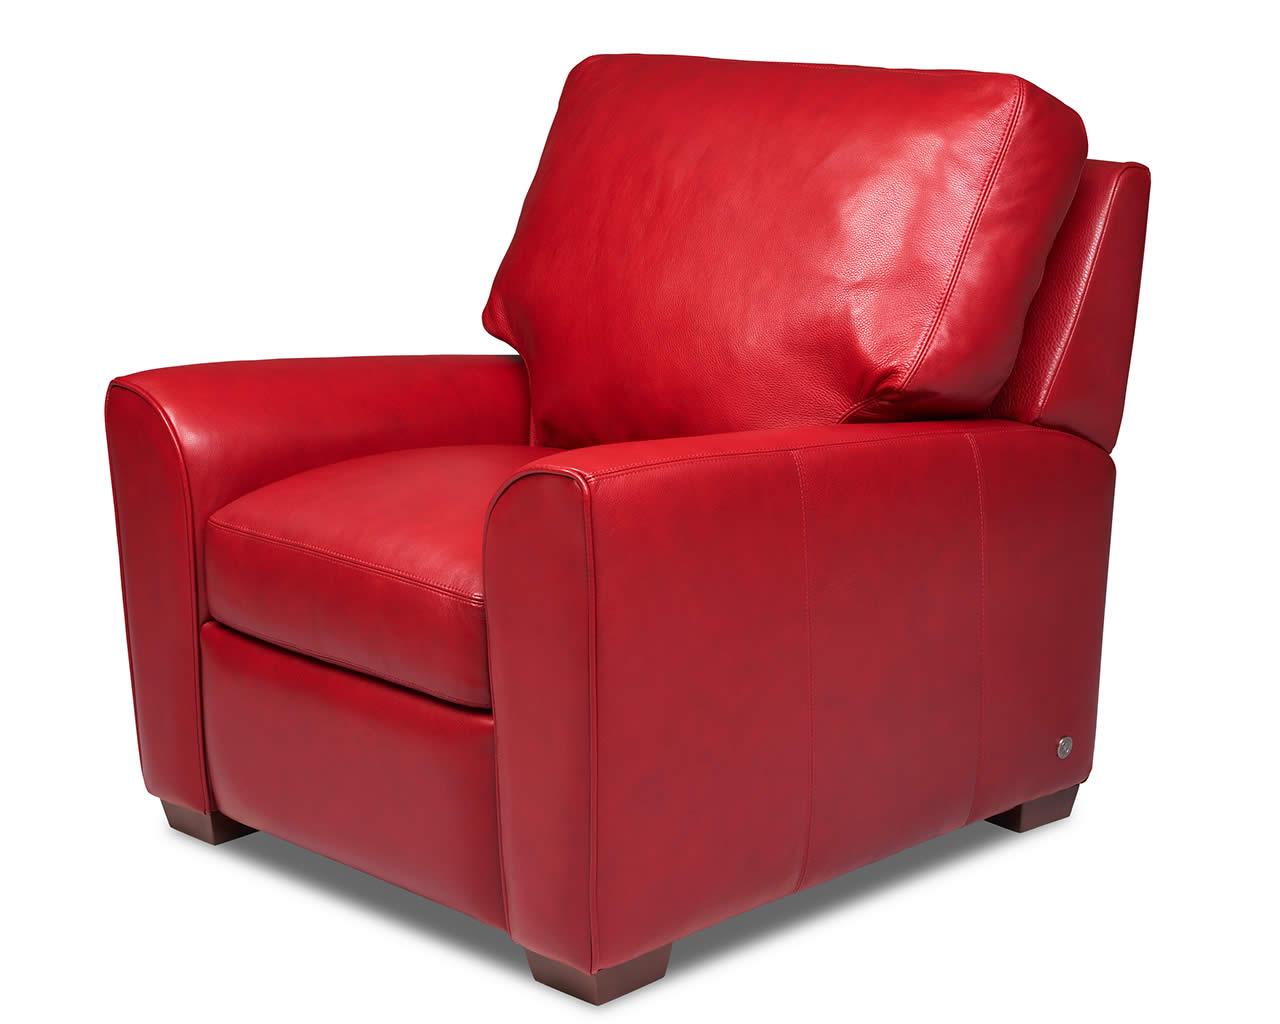 Kayla Recliner Sofas Amp Chairs Of Minnesota